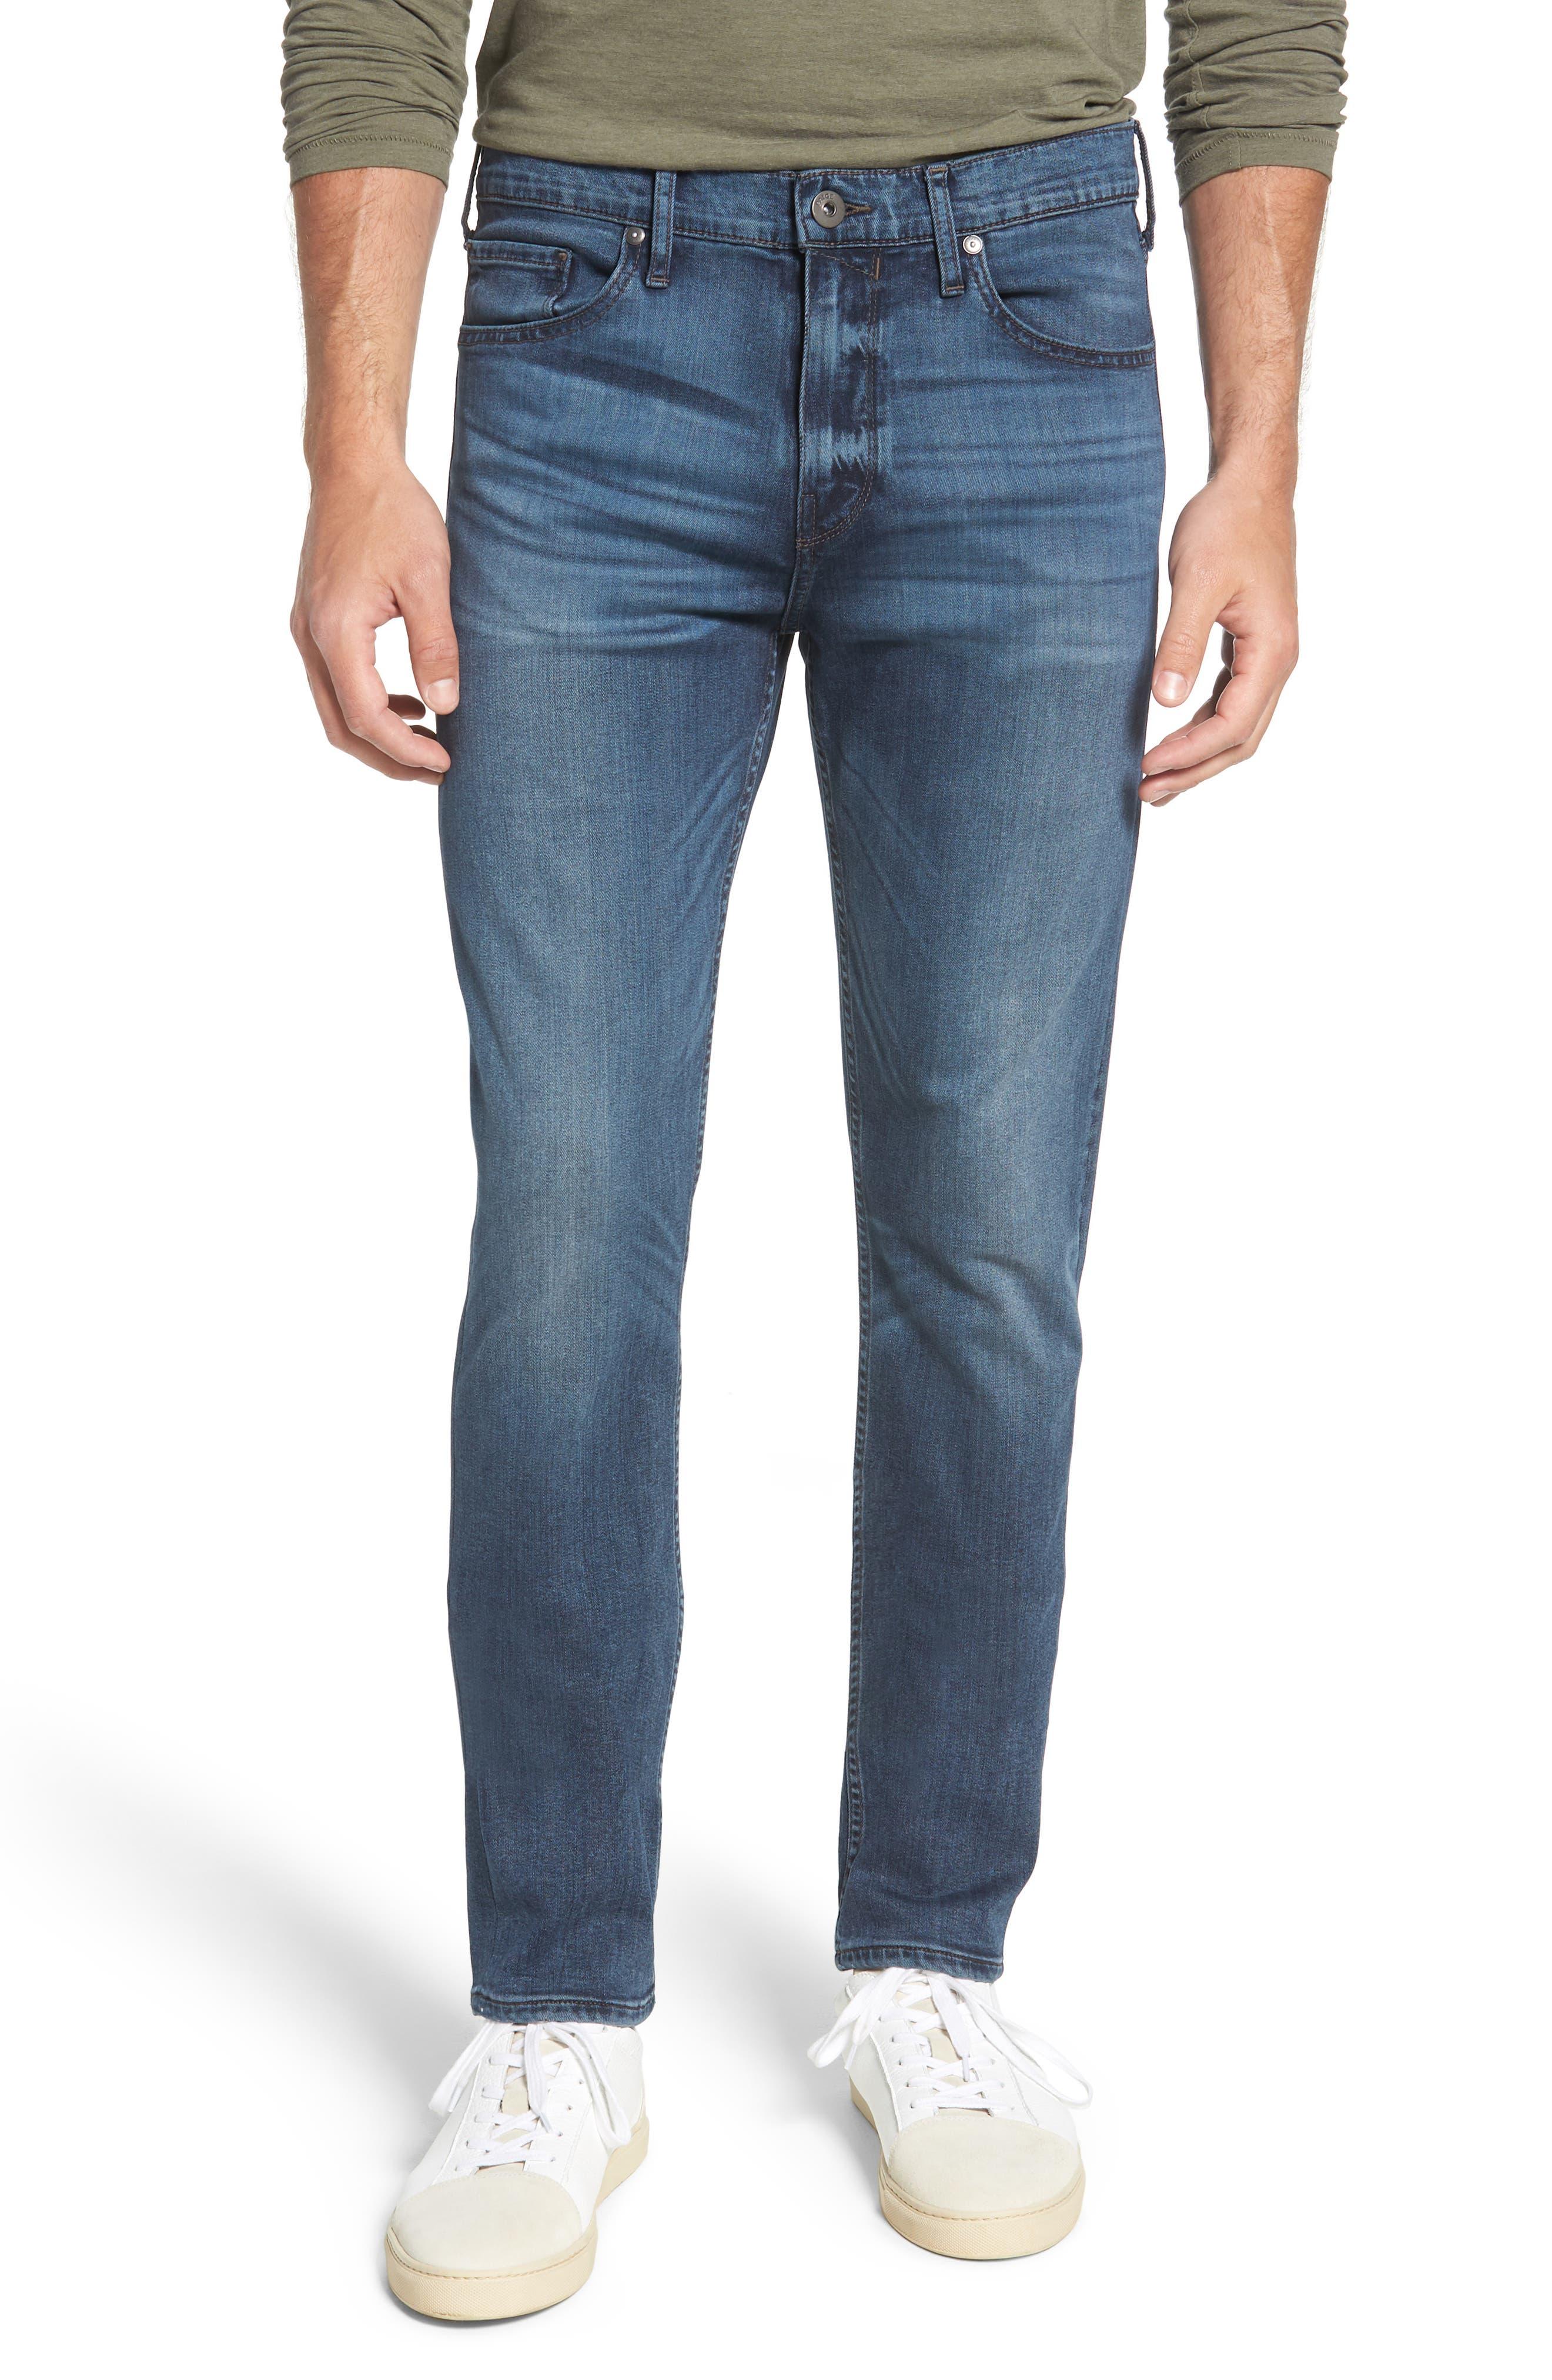 Transcend - Lennox Slim Fit Jeans,                         Main,                         color, Grammercy